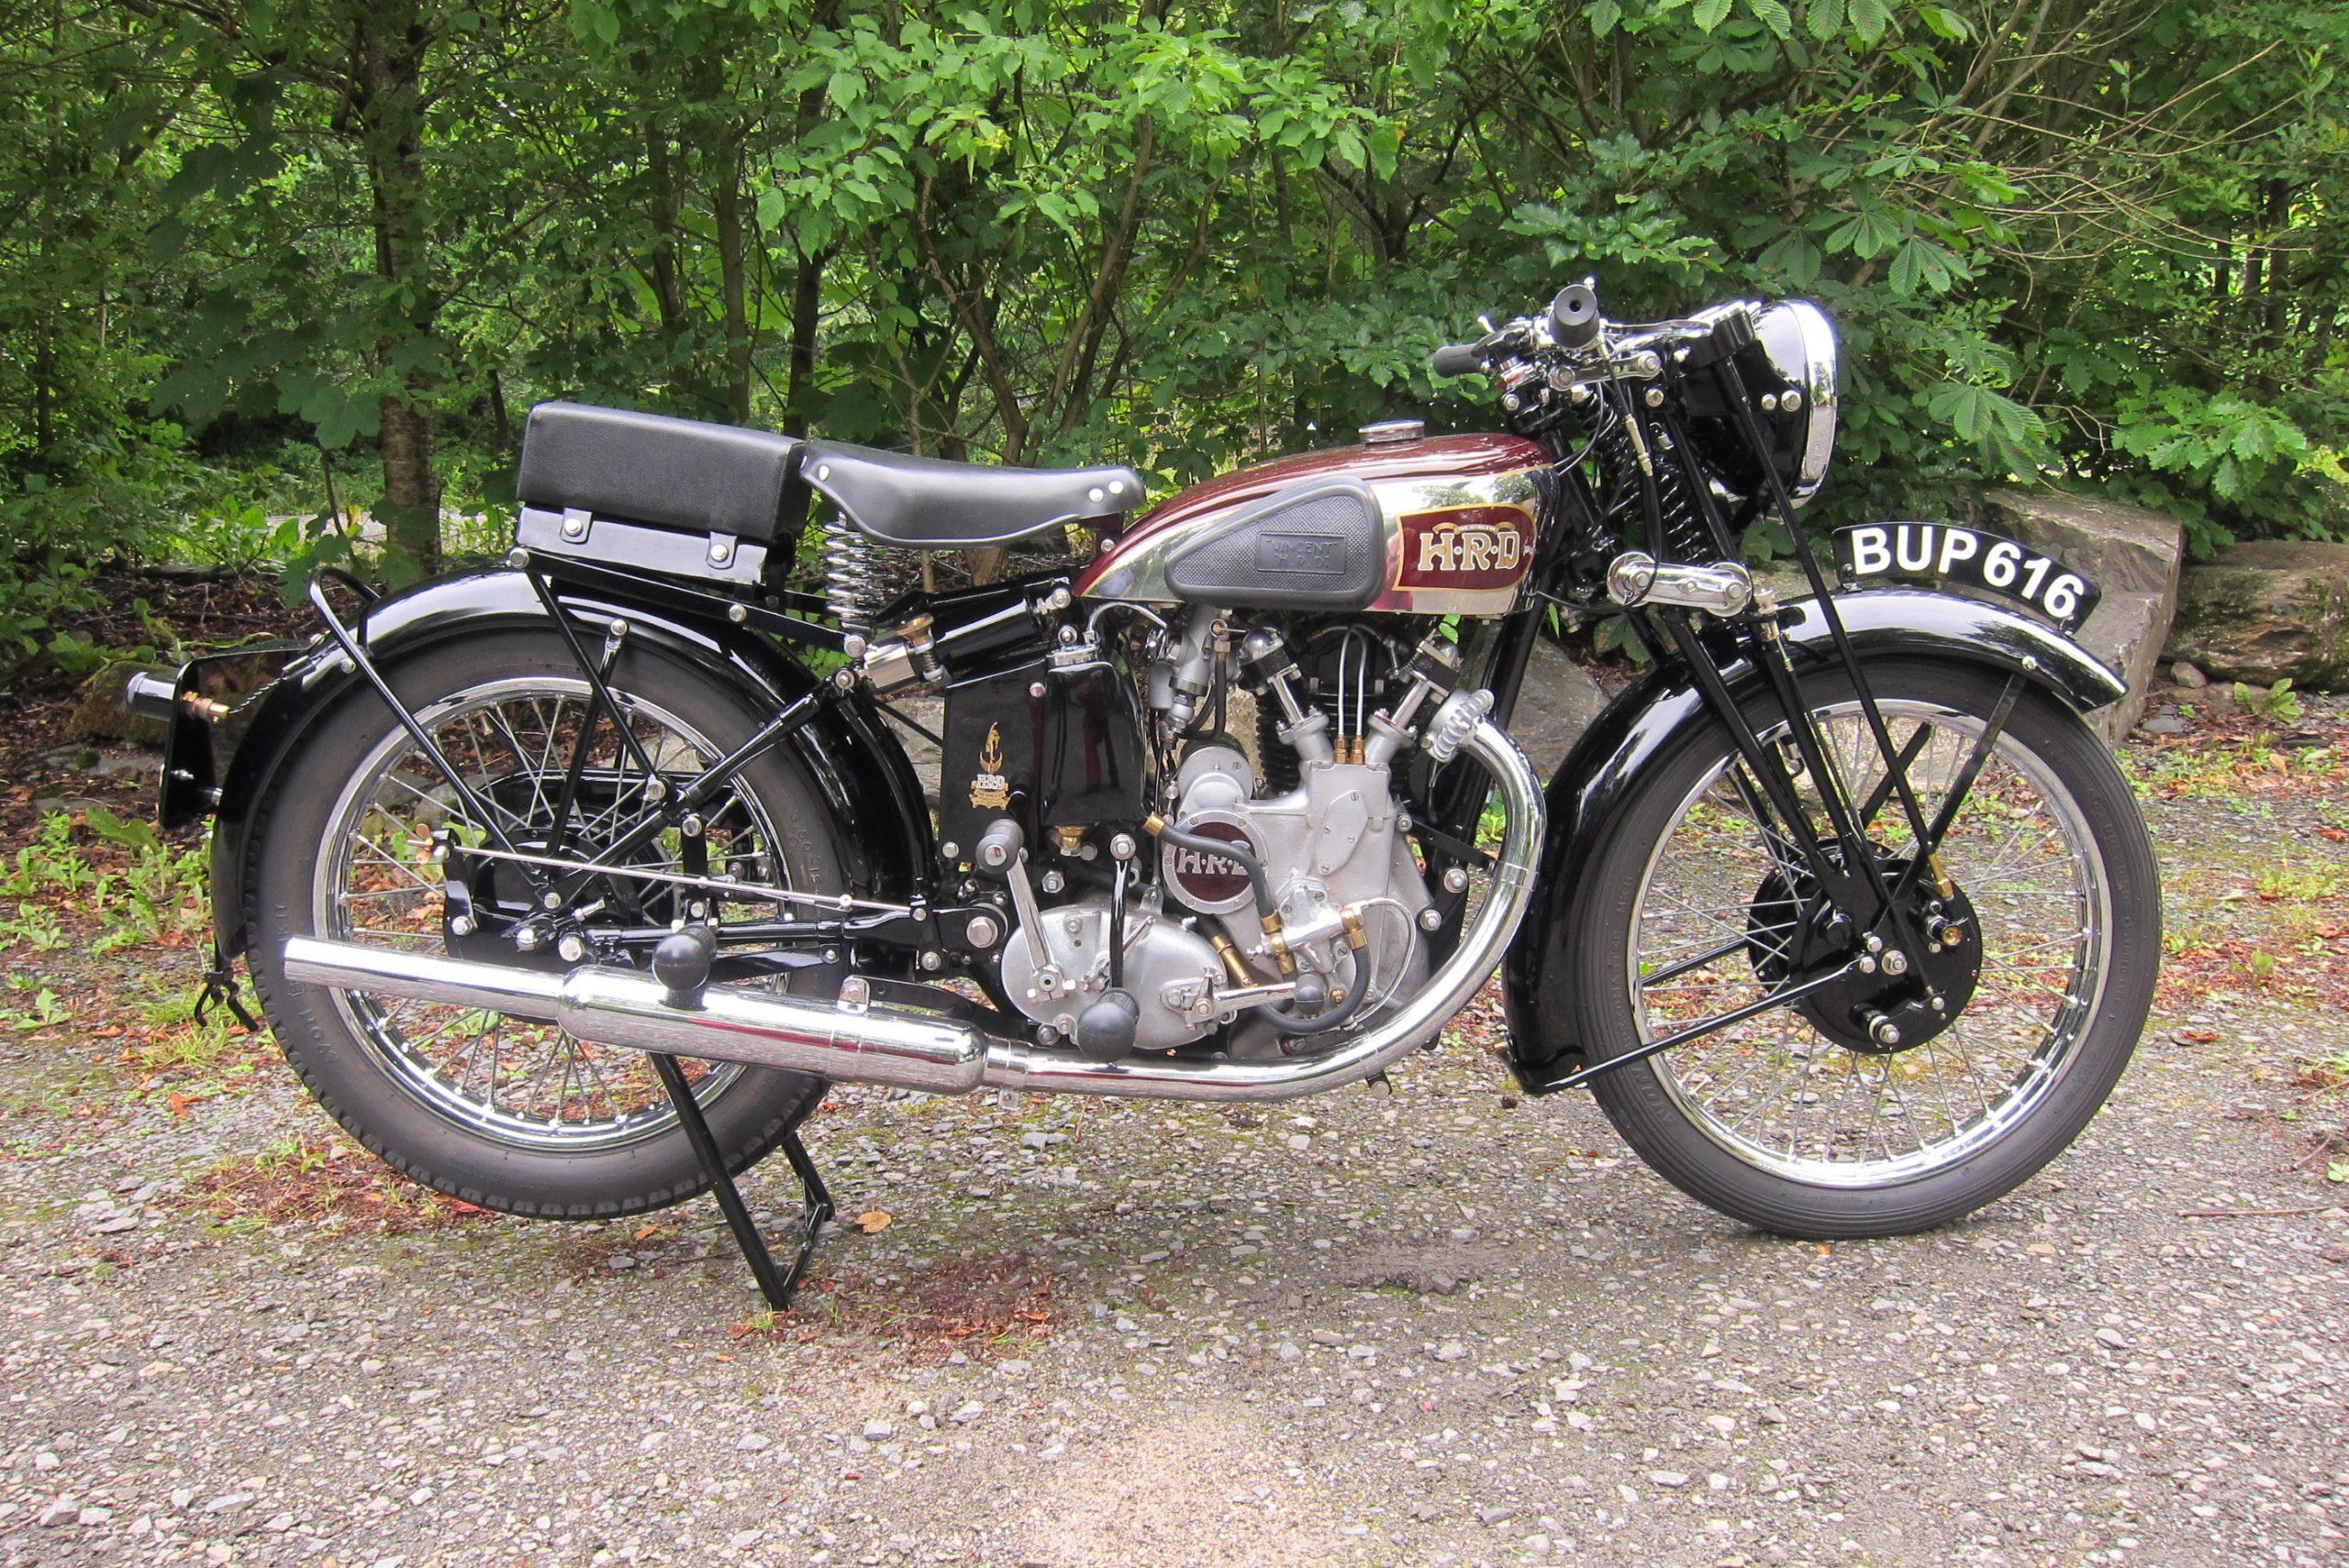 1937 Vincent HRD 498cc Comet Series A